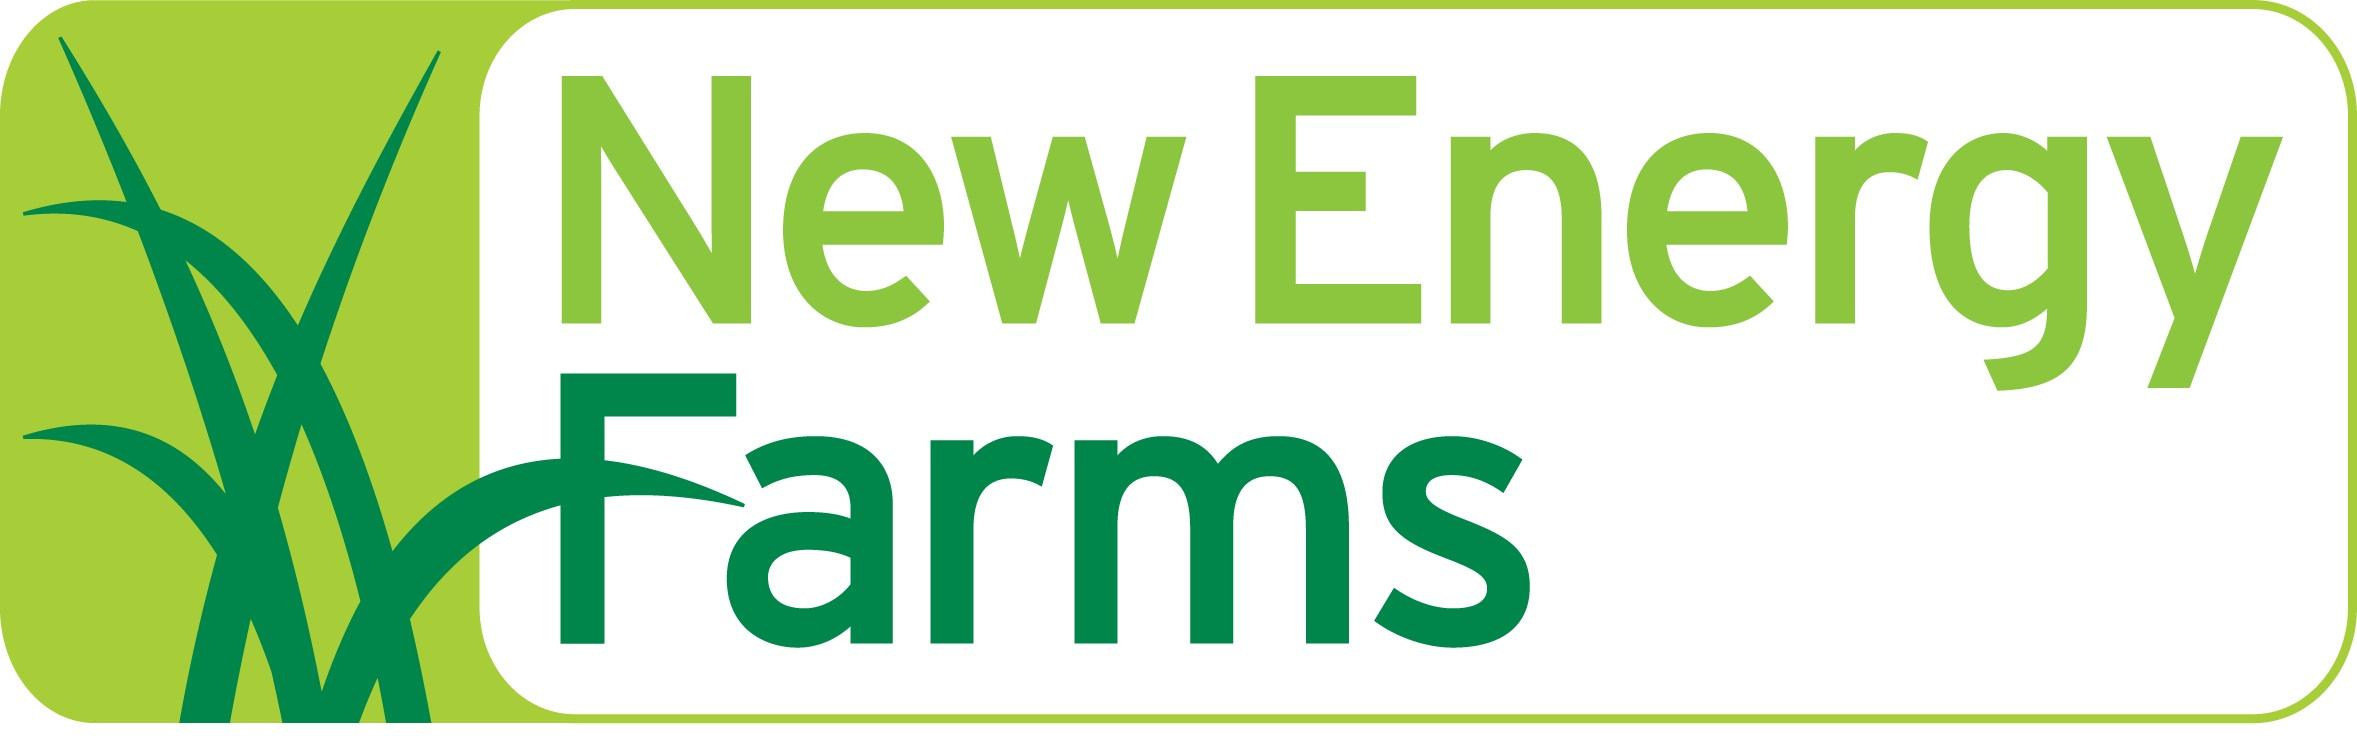 New Energy Farms logo